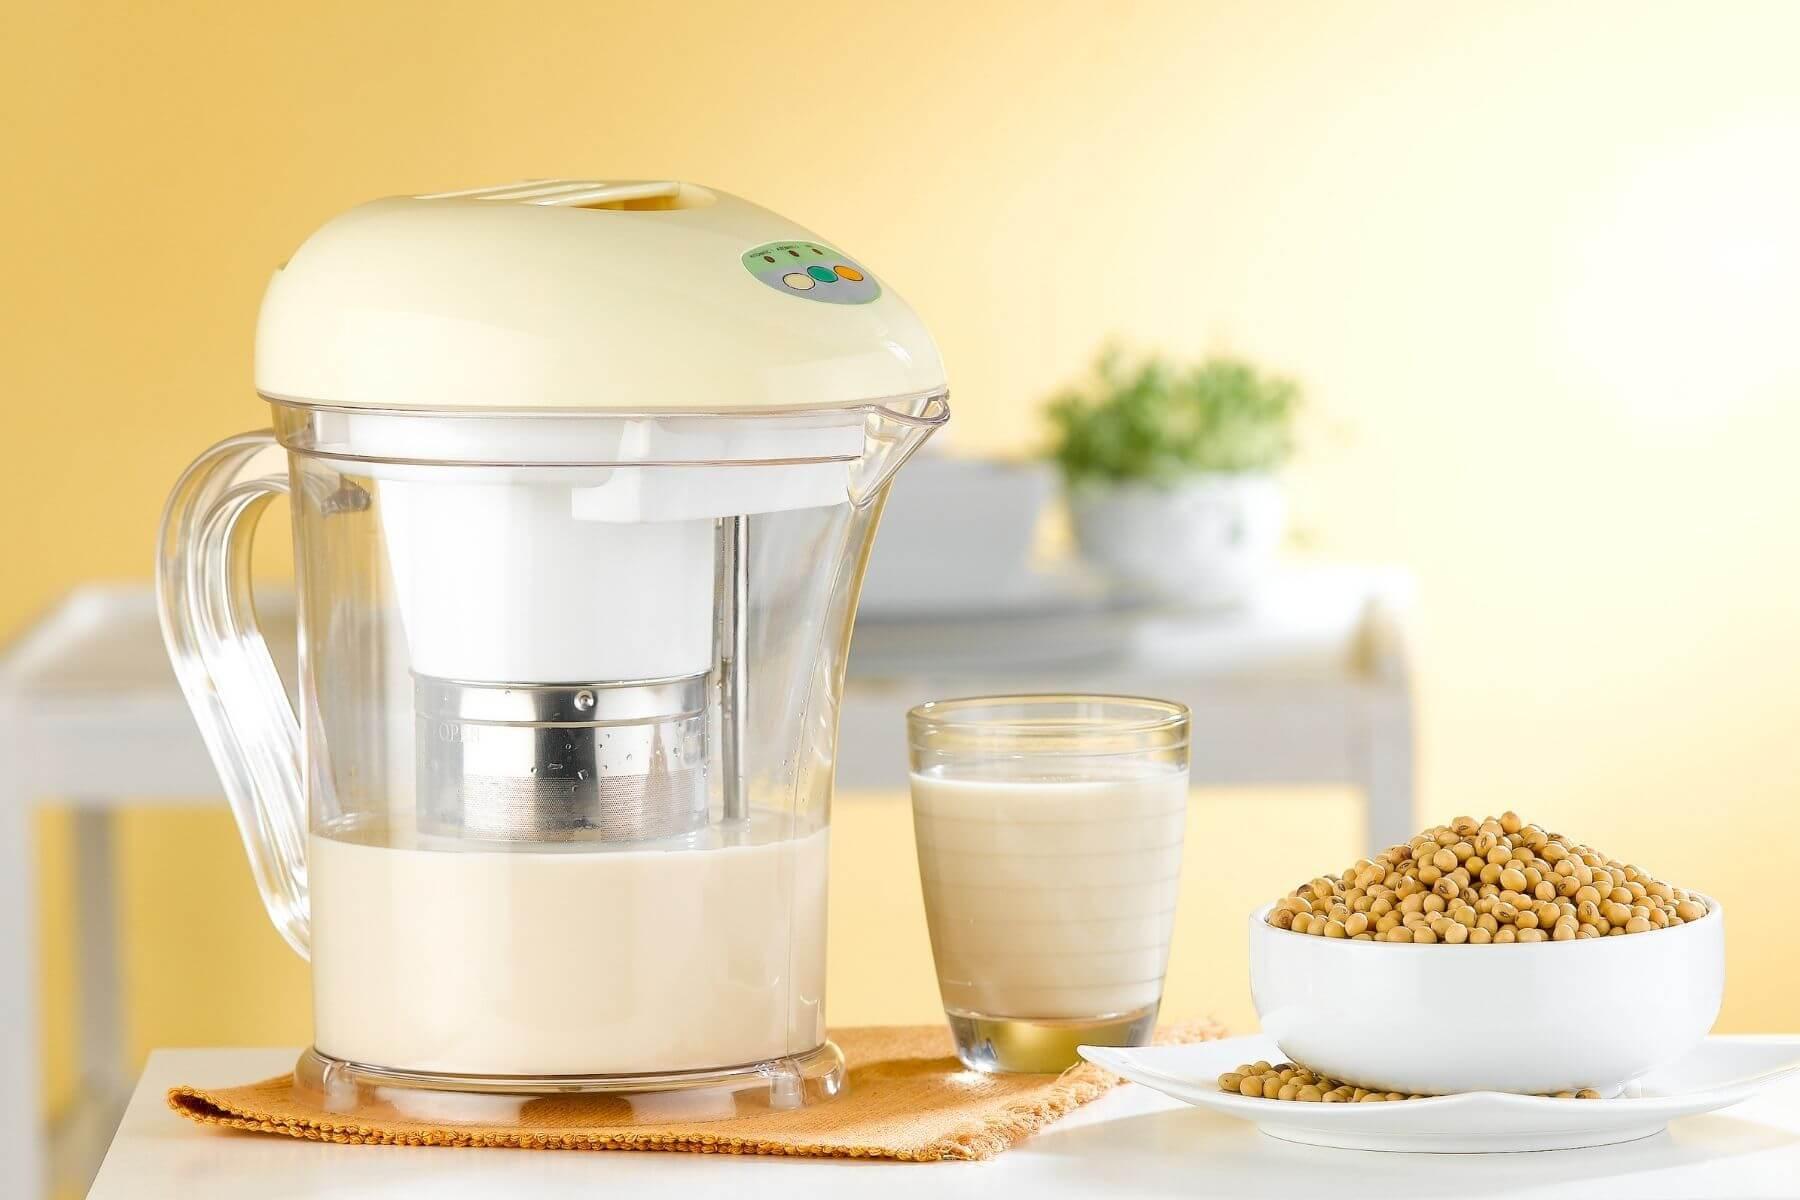 HappyFresh_How_To_Make_Homemade_Soy_Milk_Boiled